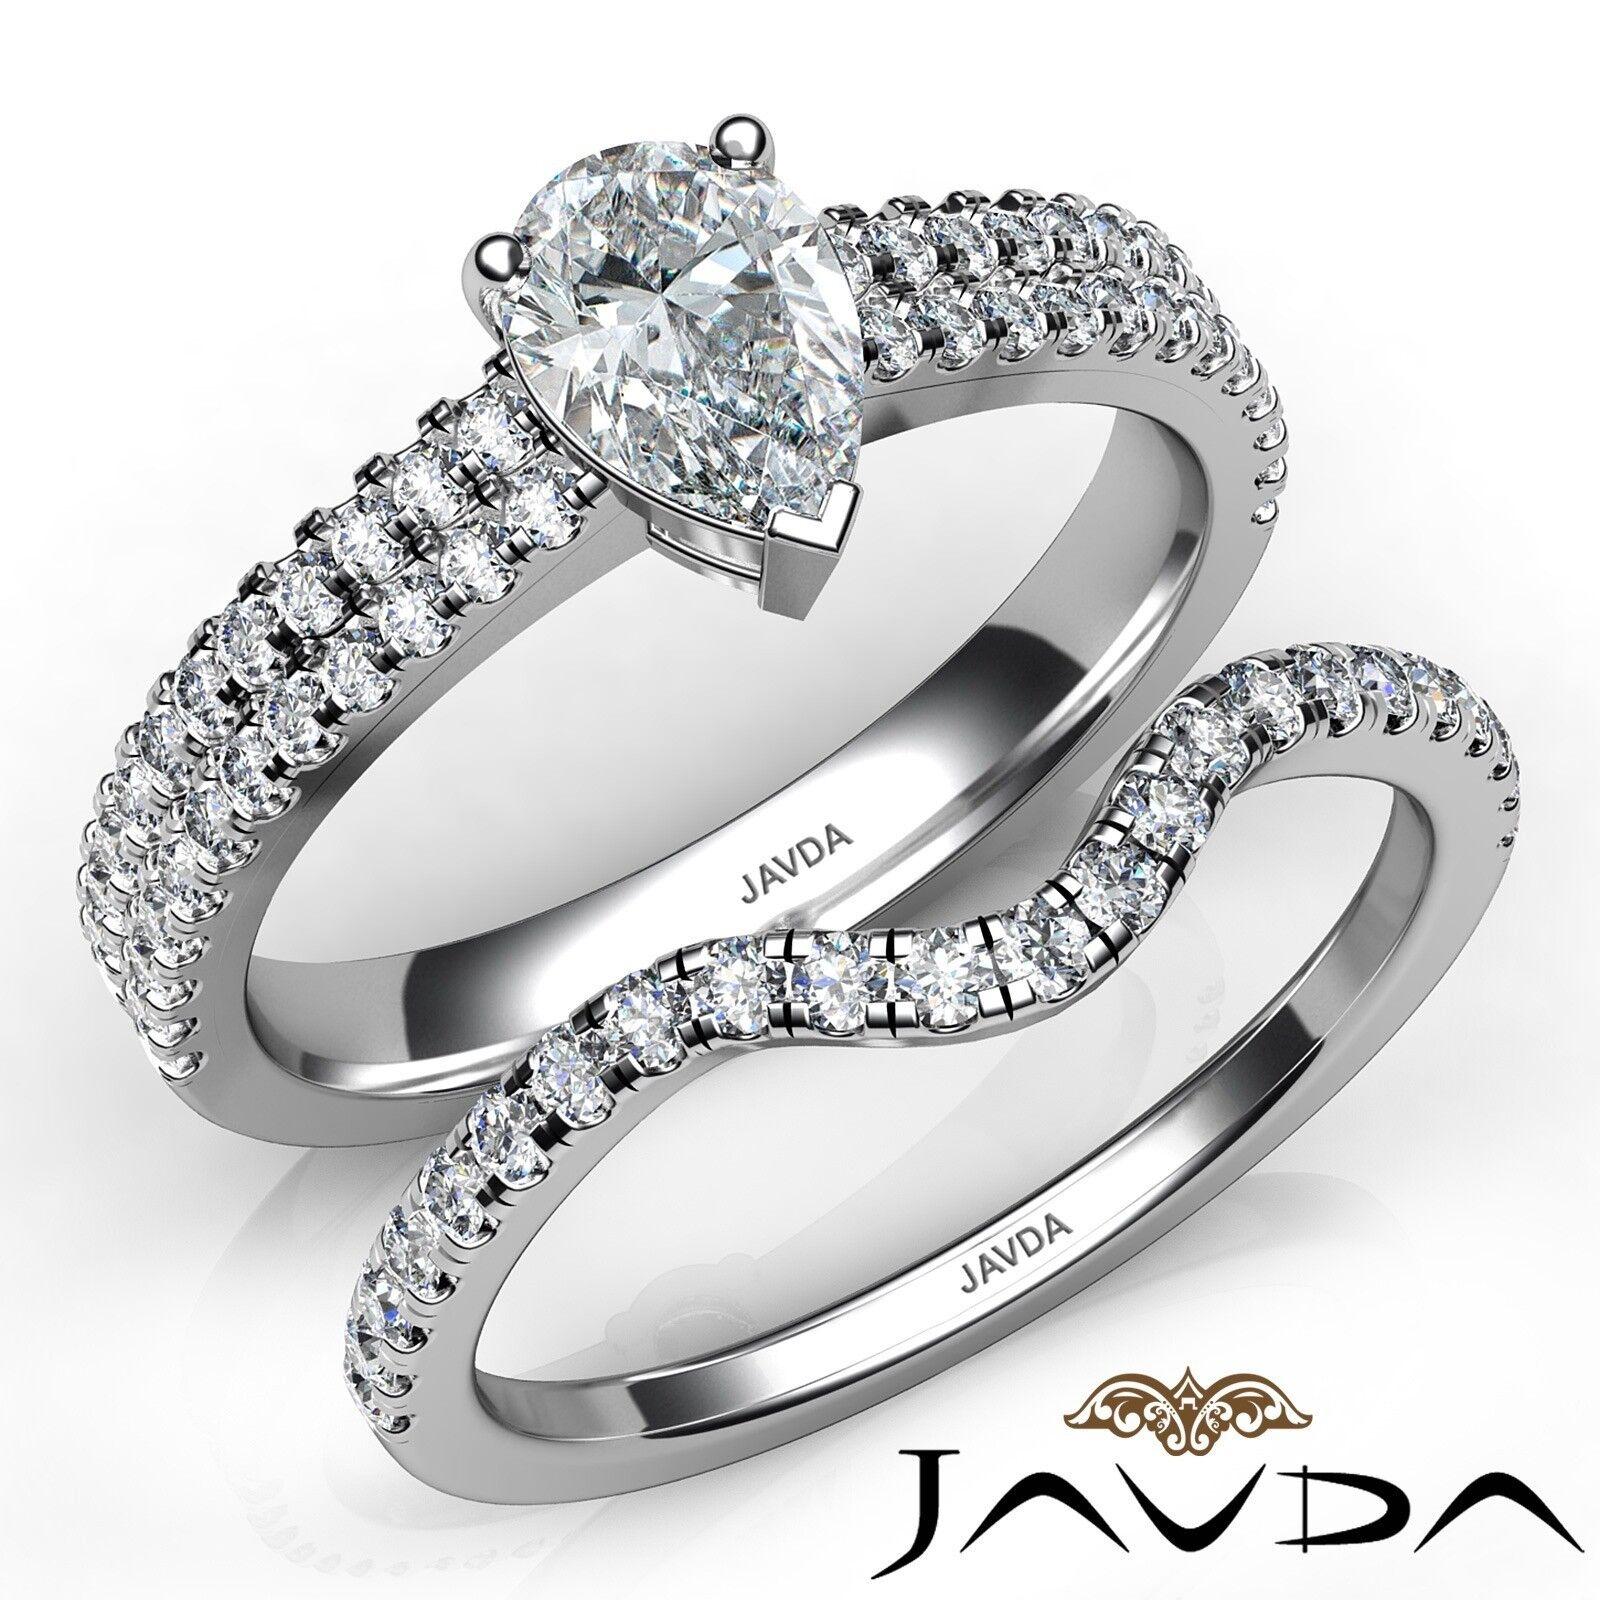 1.5ctw Bridal Scalloped Pave Set Pear Diamond Engagement Ring GIA E-VS1 W Gold